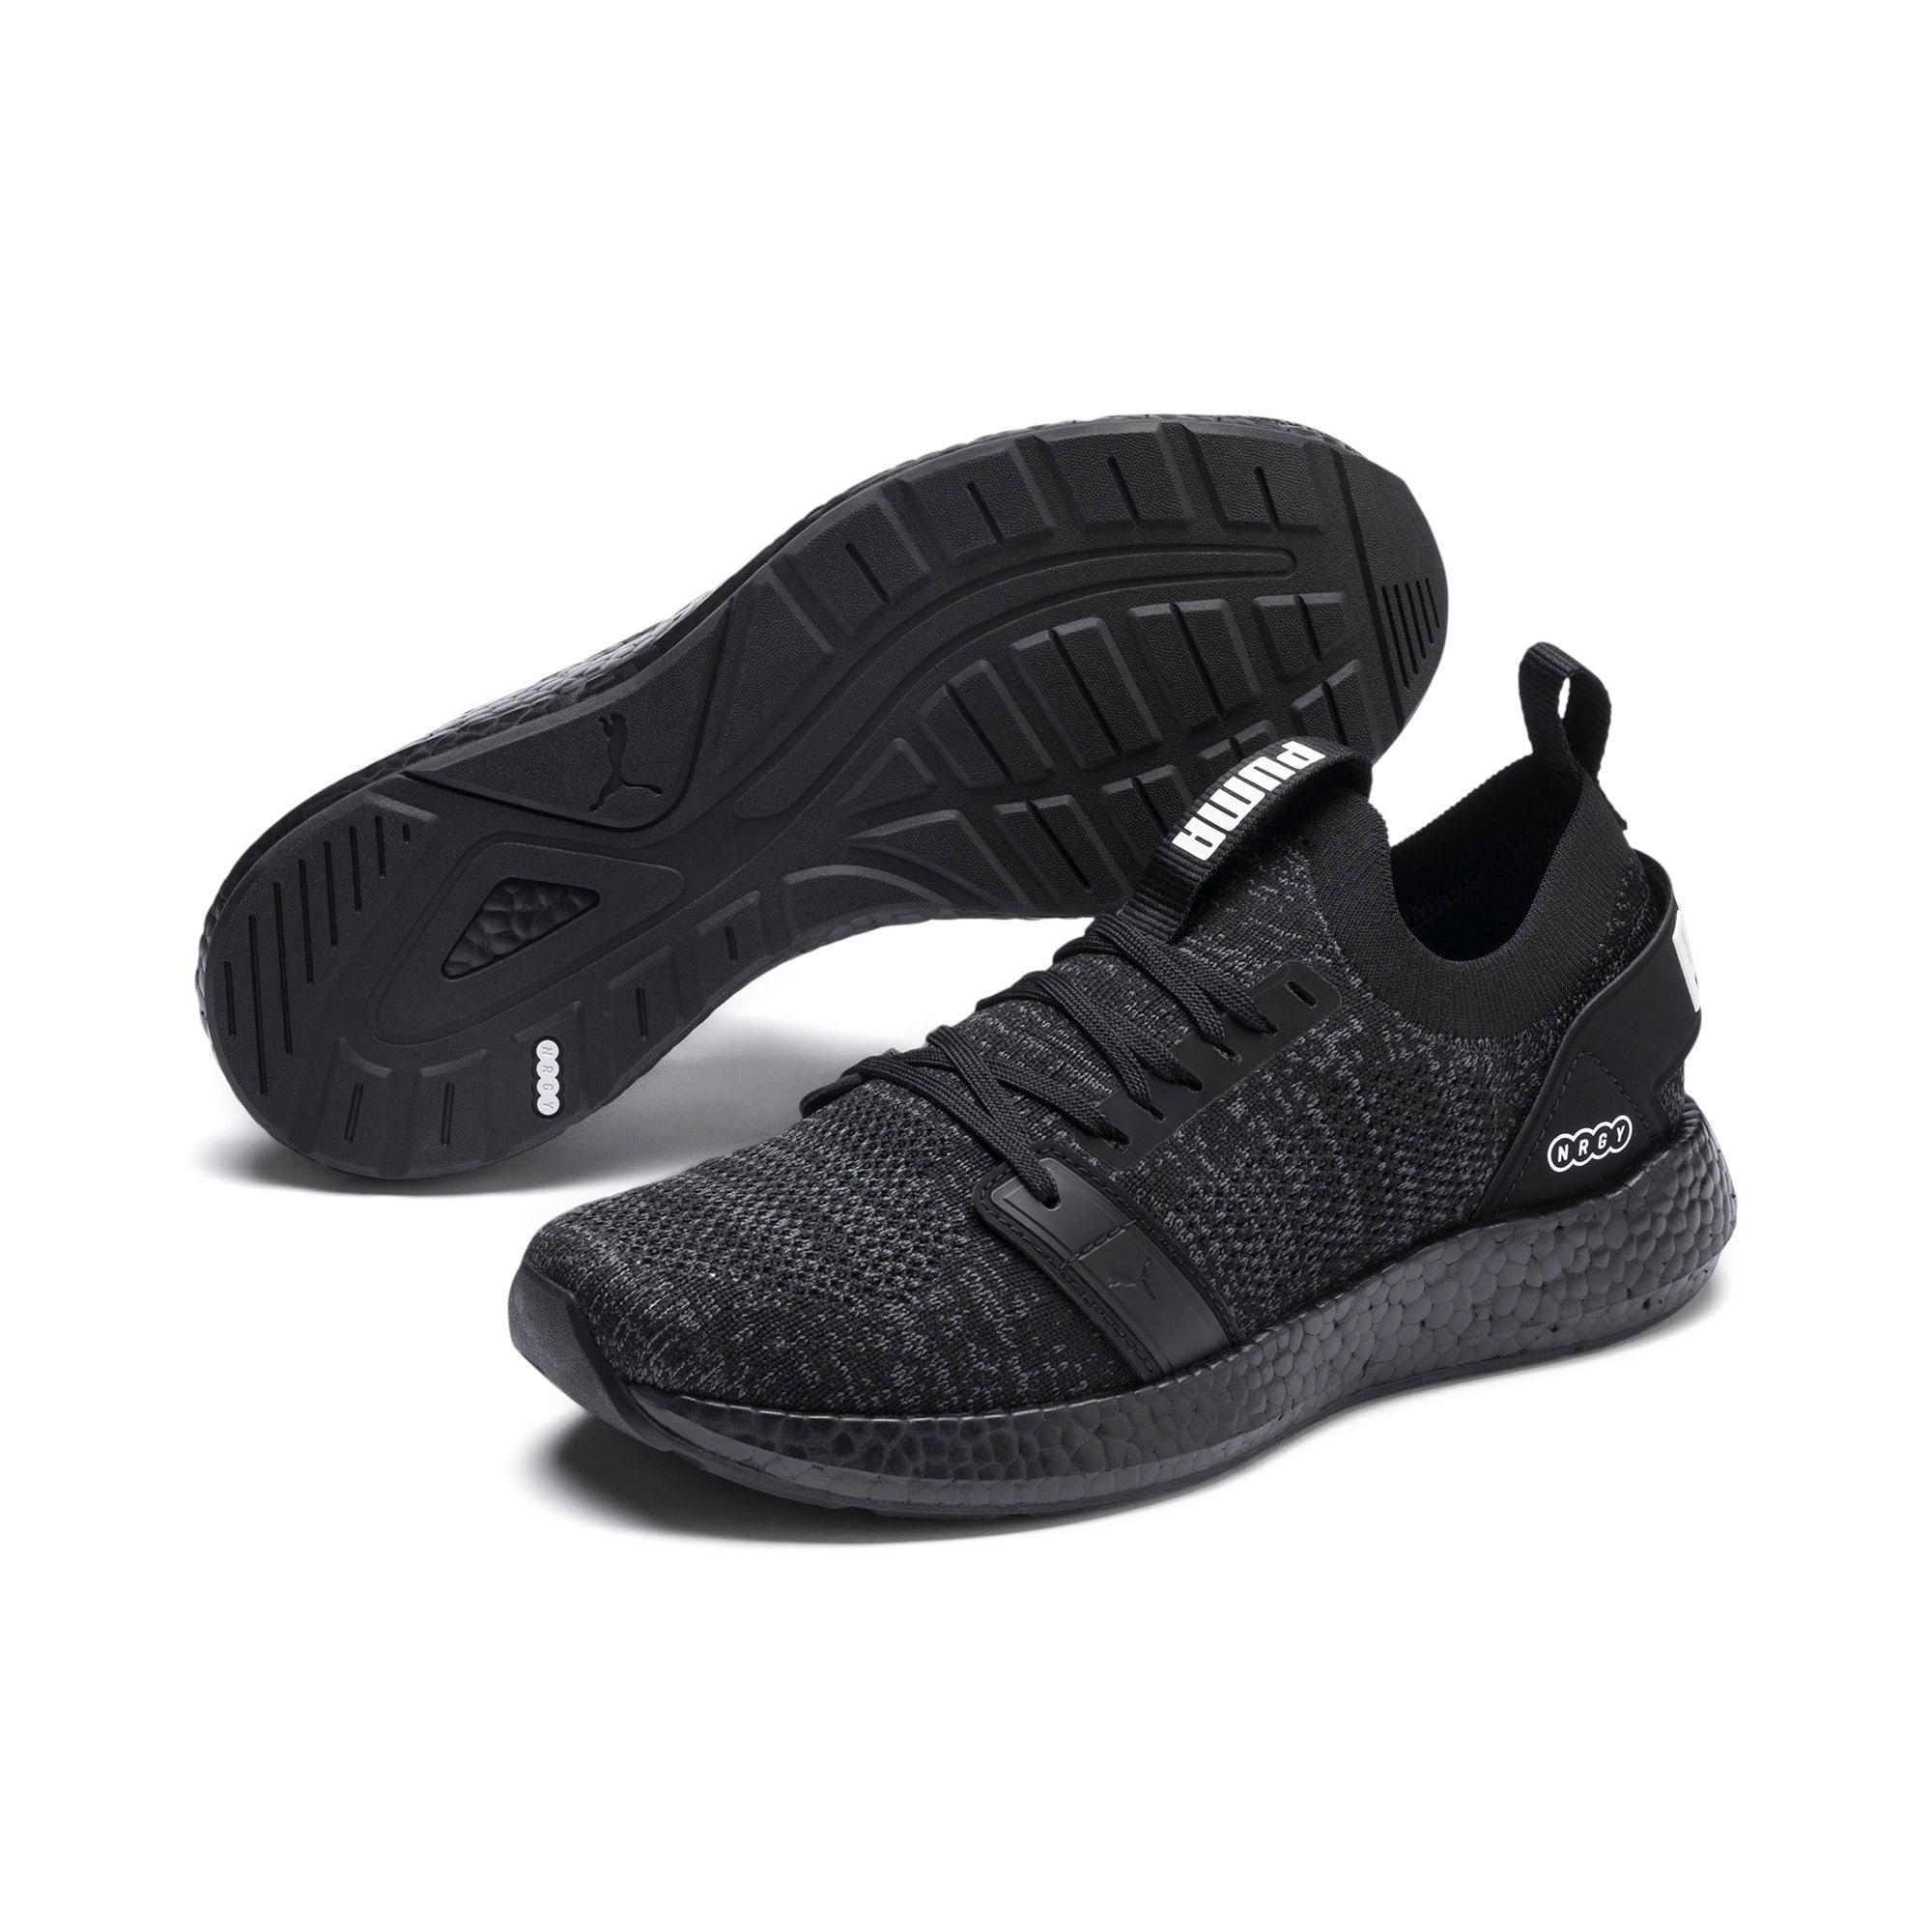 Thumbnail 2 of NRGY Neko Engineer Knit Women's Running Shoes, Puma Black-Puma Black, medium